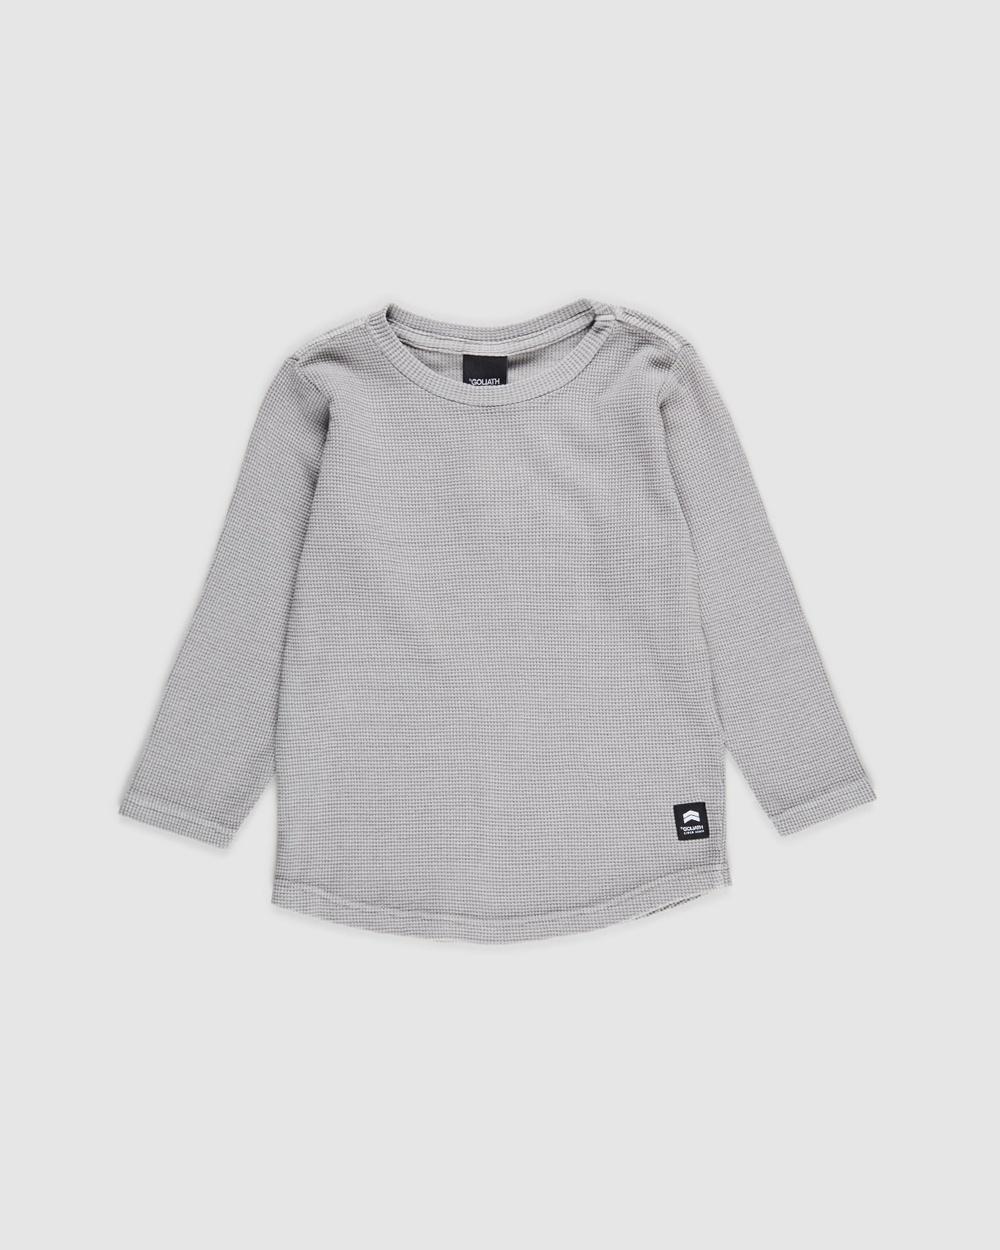 St Goliath - Long Sleeve Waffle Tee   Kids - T-Shirts & Singlets (Grey) Long Sleeve Waffle Tee - Kids